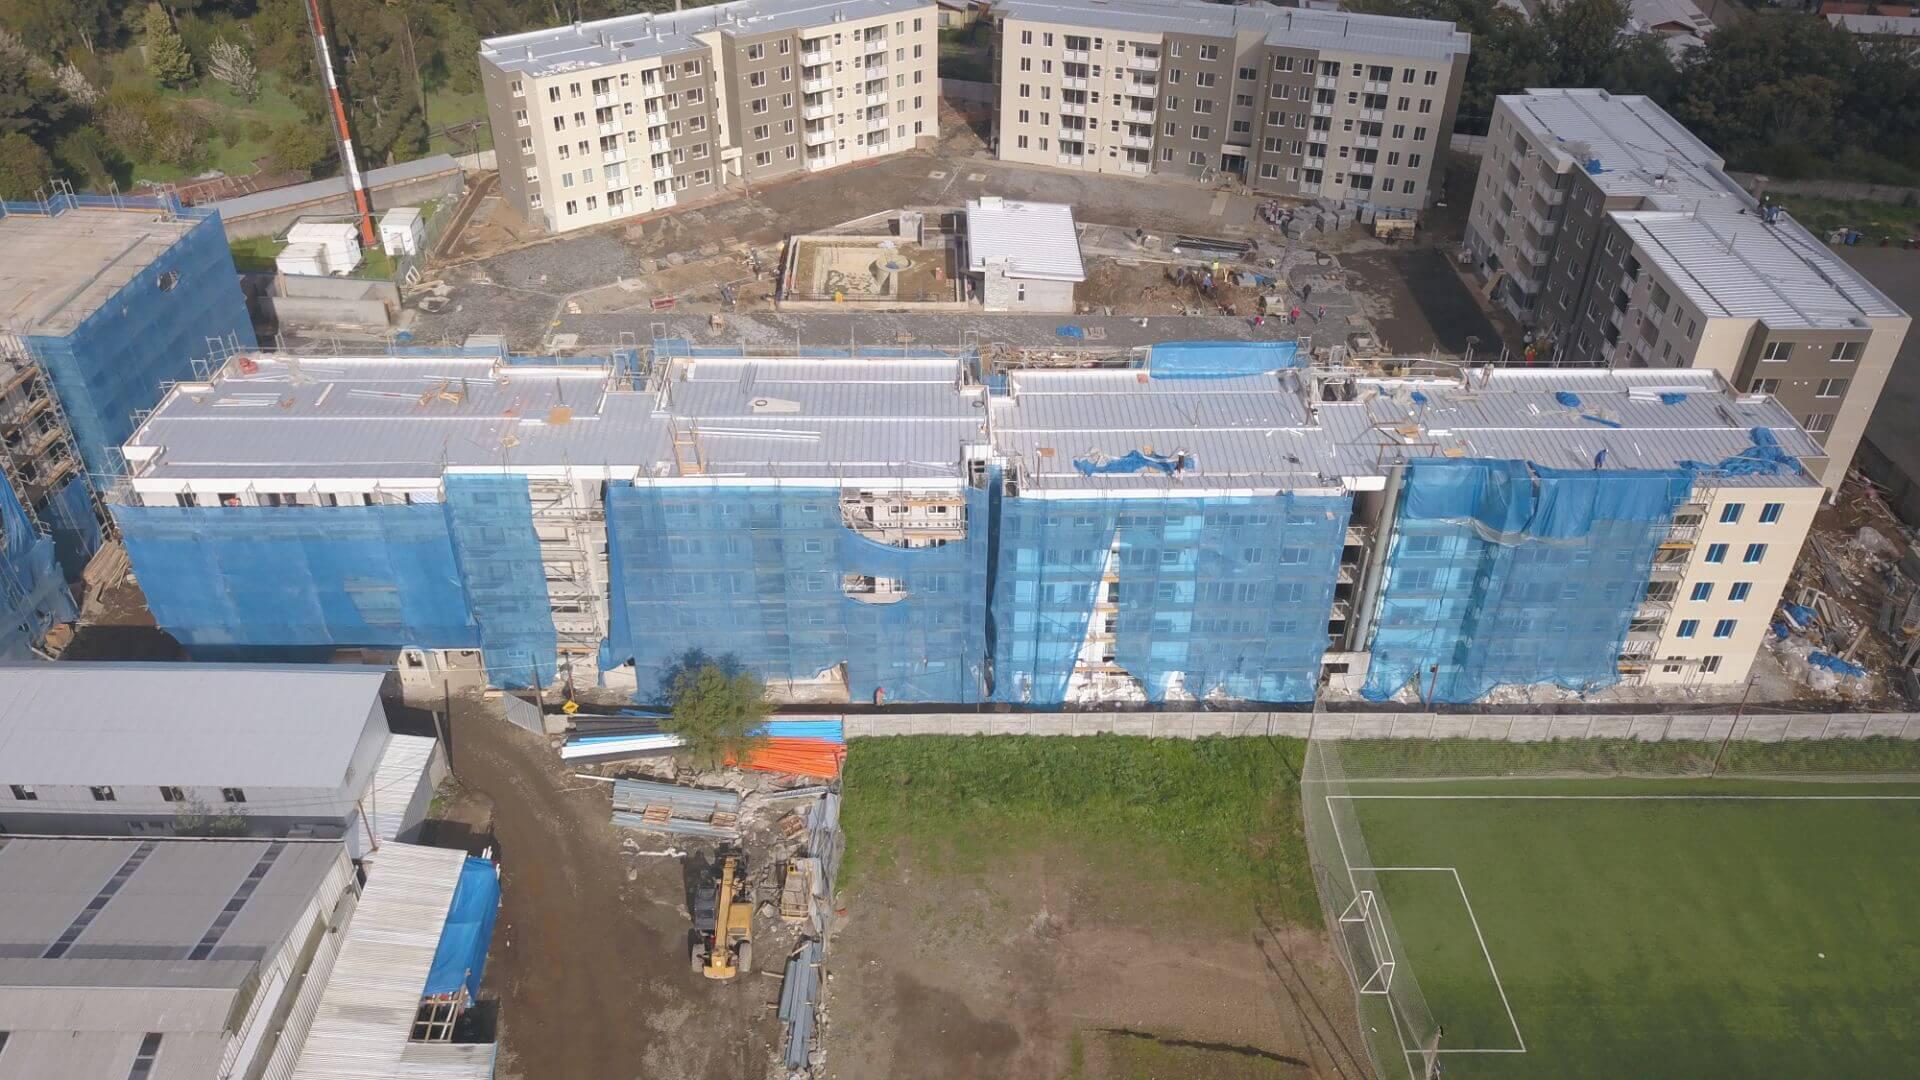 Condominio-Parque-Oriente-avance-obra-05